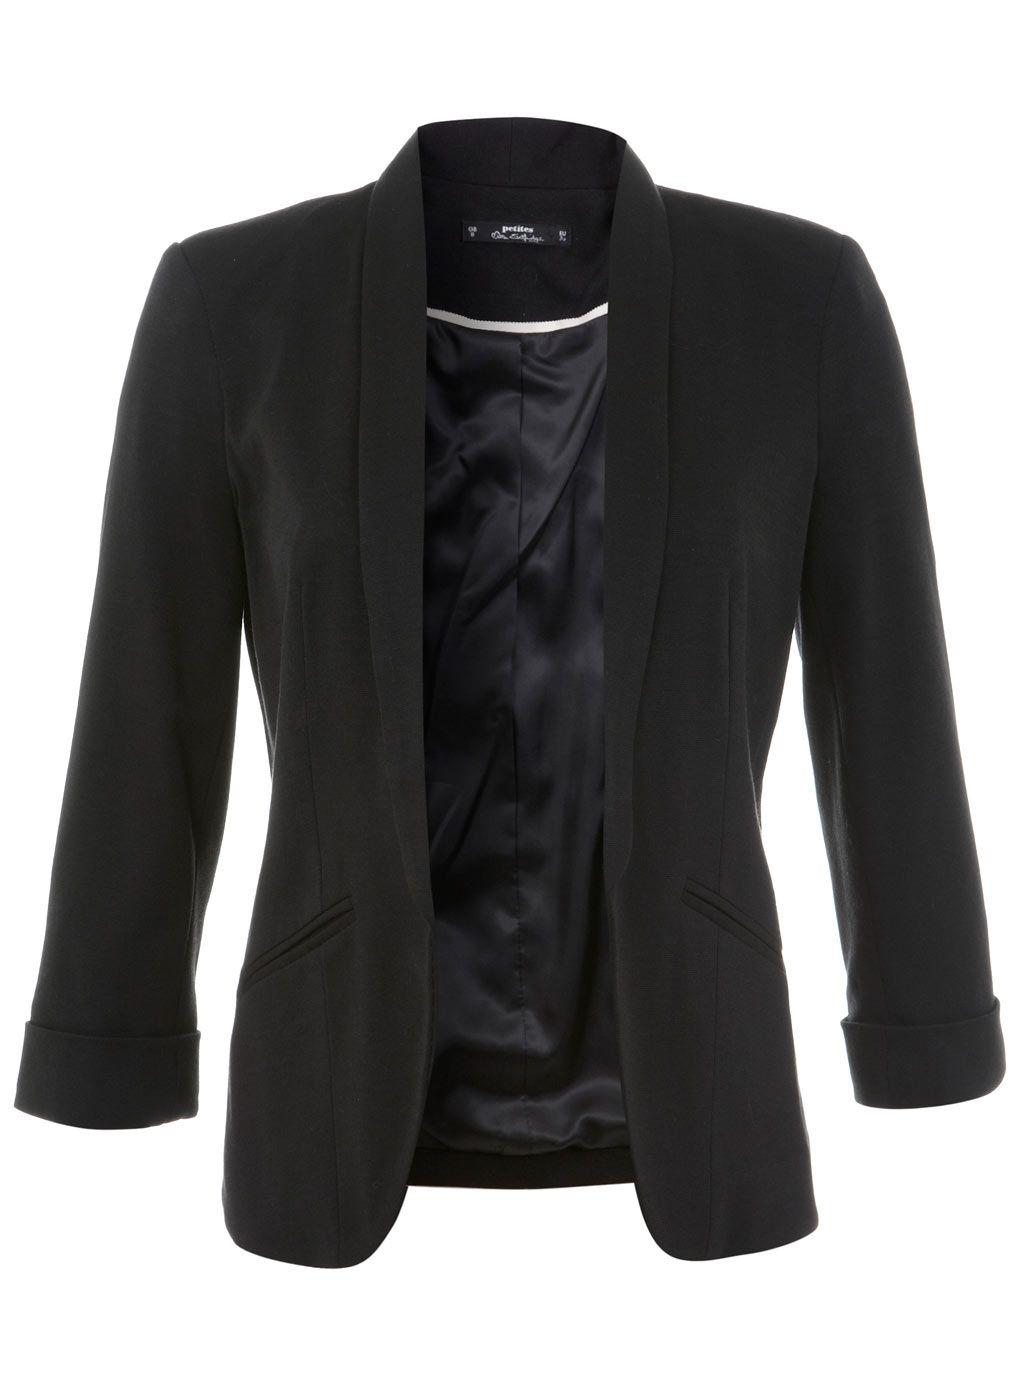 Petites Black Jersey Blazer